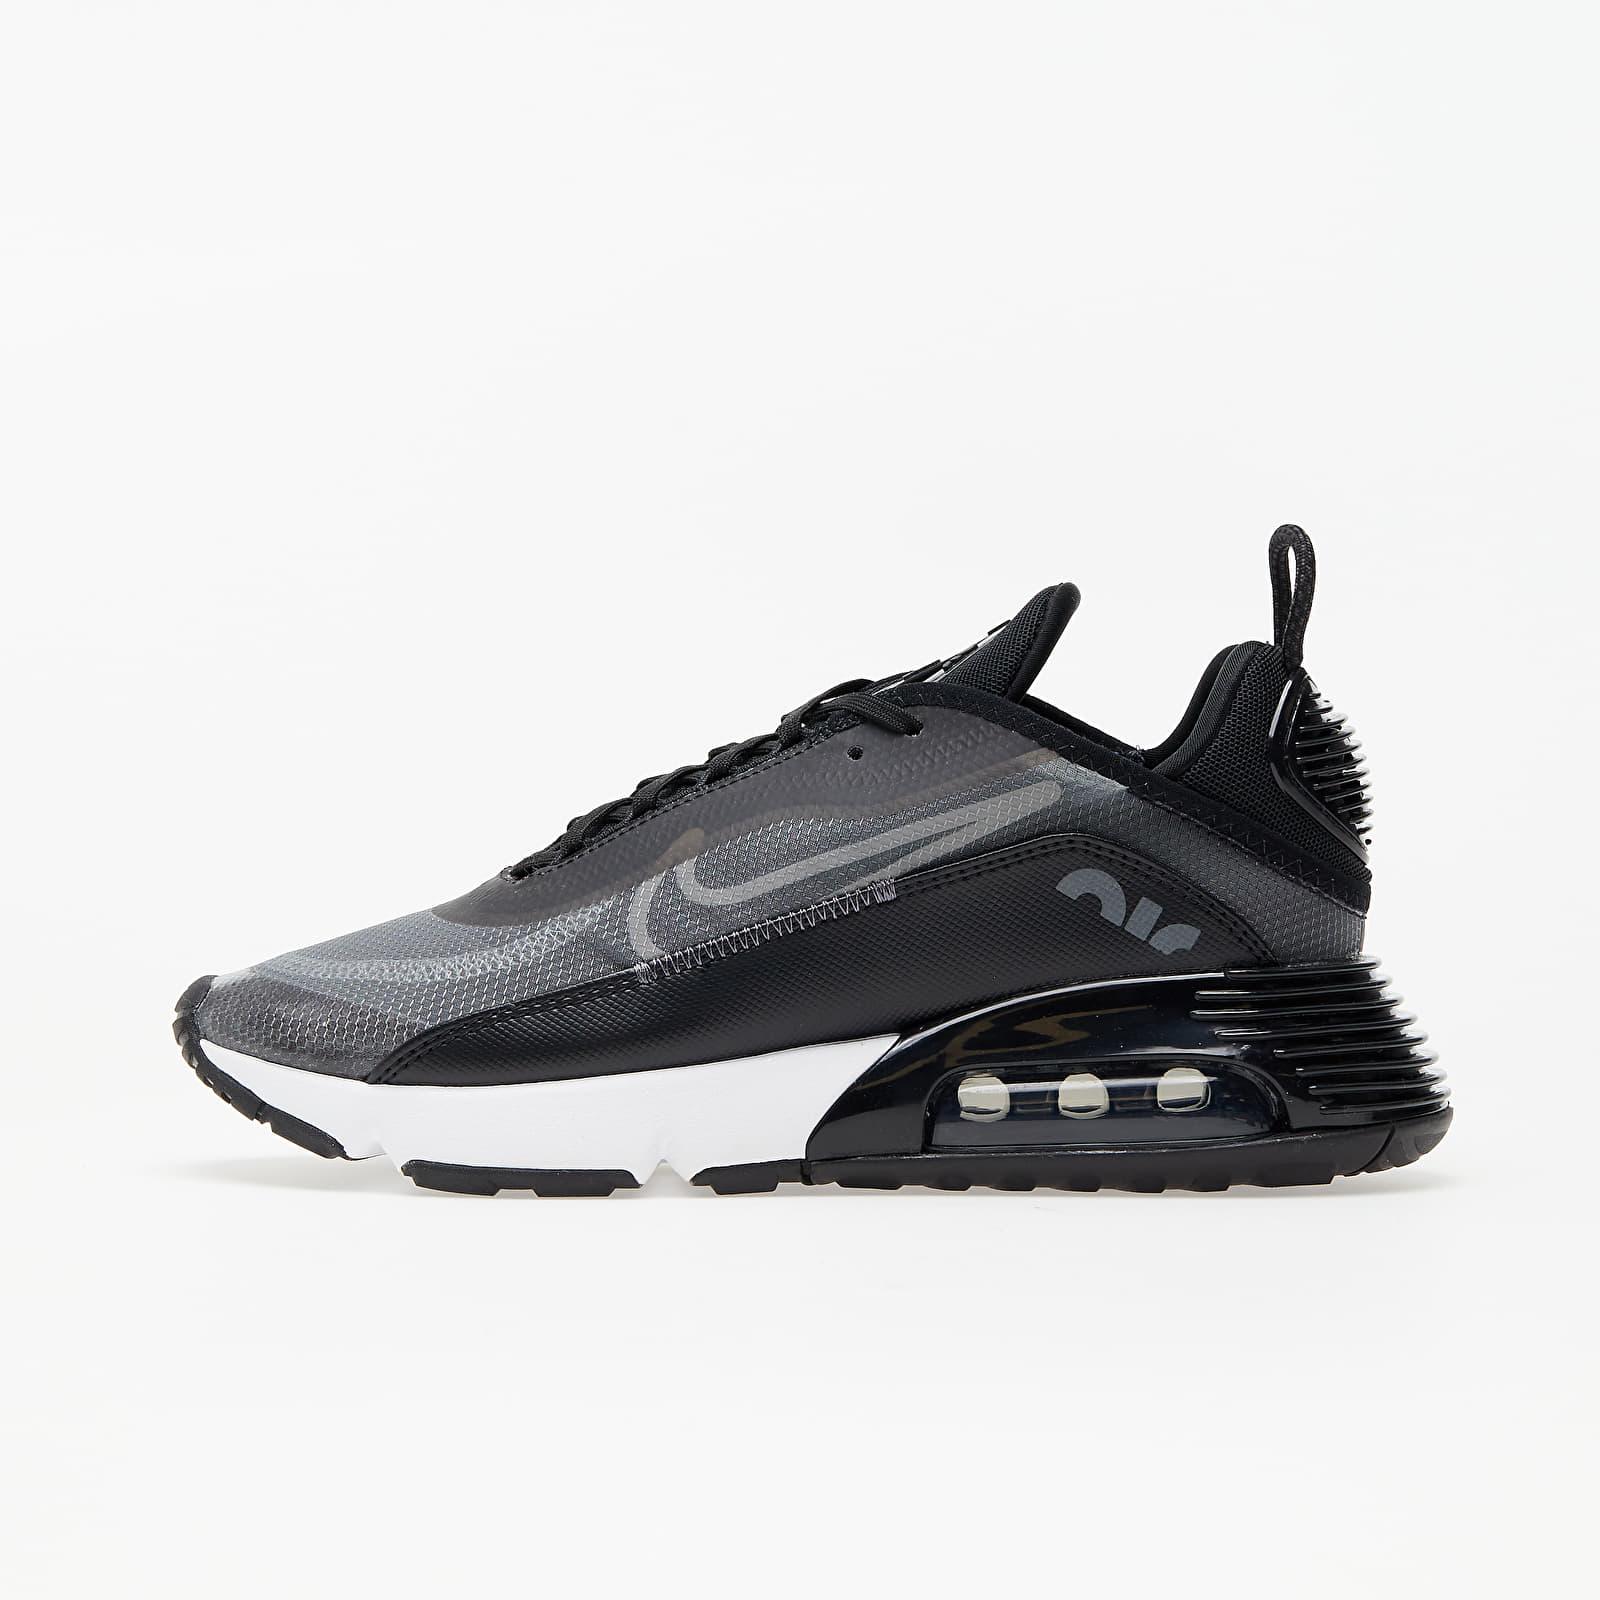 Nike Air Max 2090 Black/ White-Wolf Grey-Anthracite CW7306-001